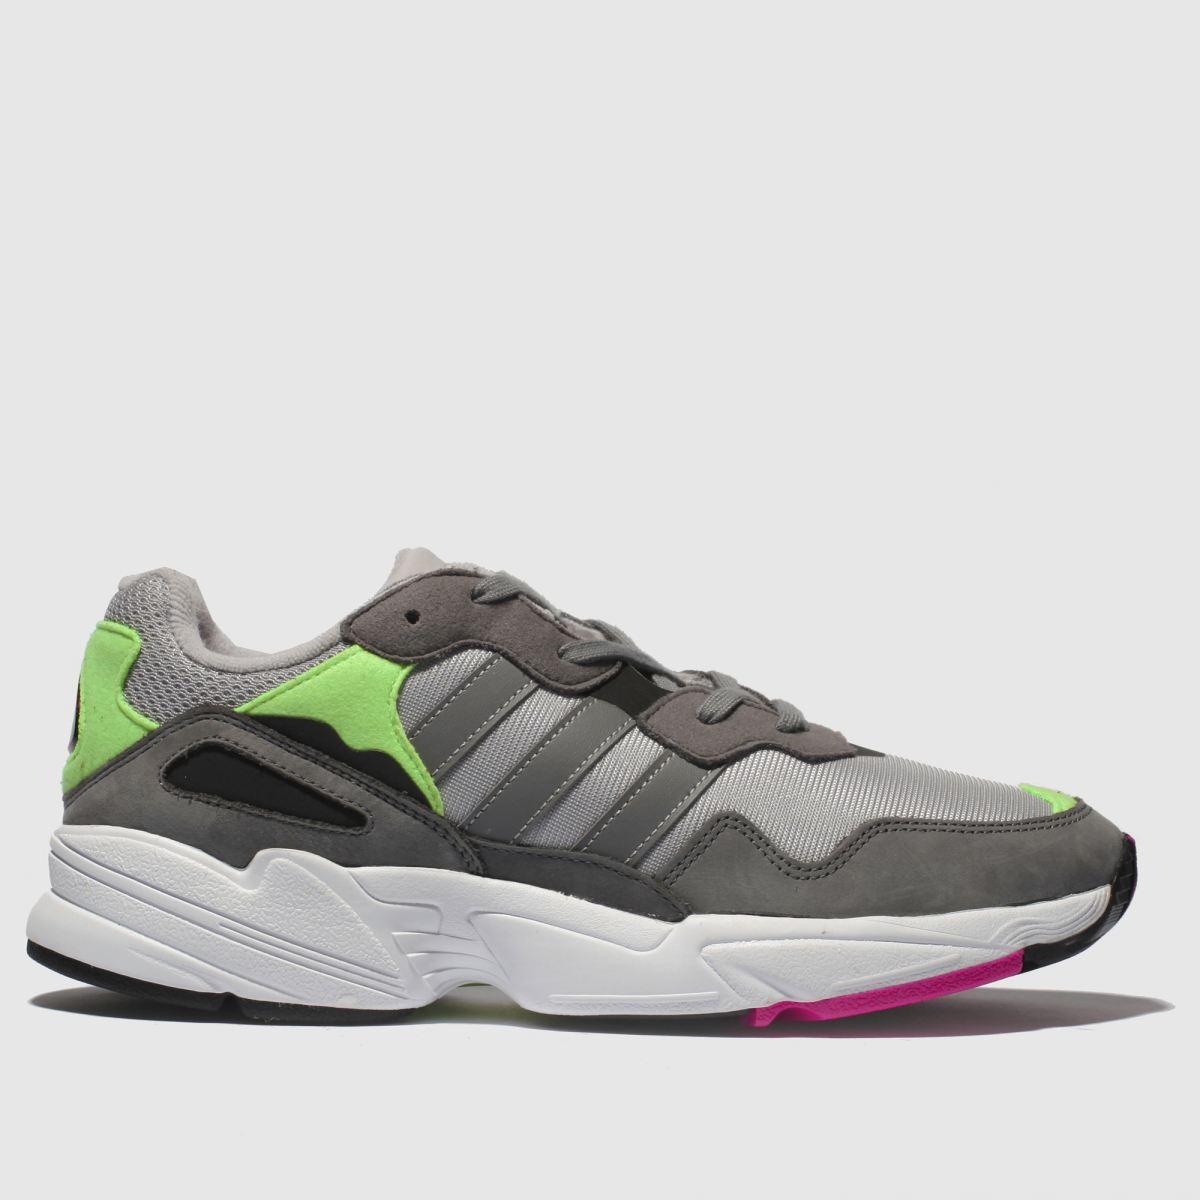 Adidas Grey Yung 96 Trainers